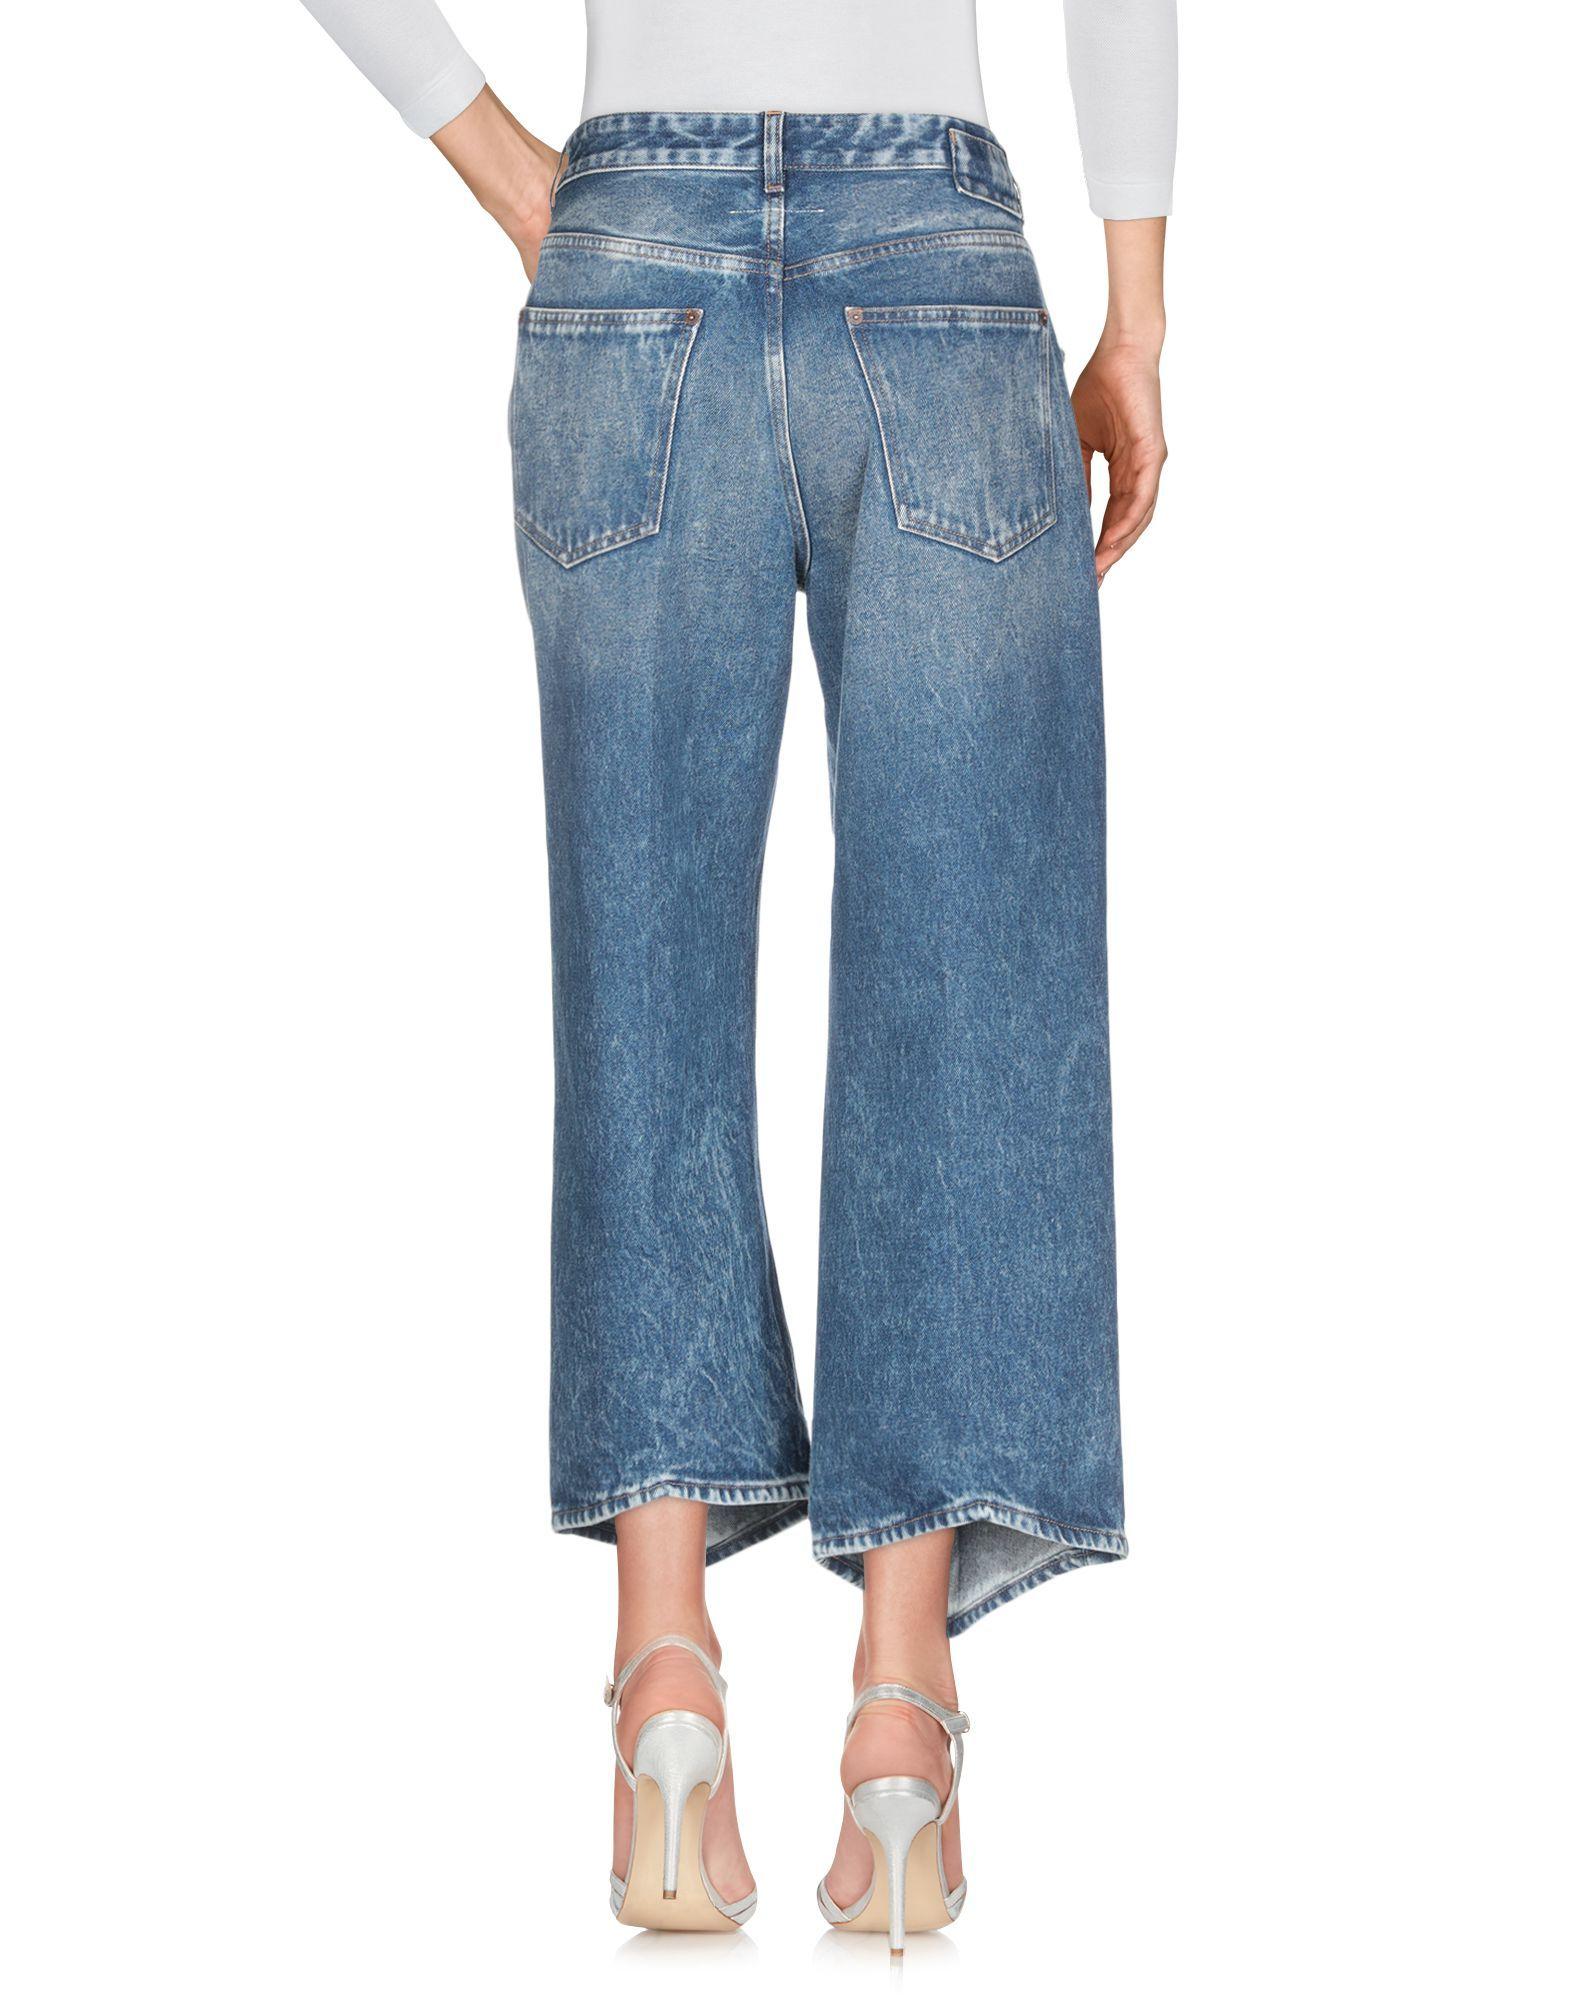 MM6 Maison Margiela Blue Cotton High Waisted Jeans